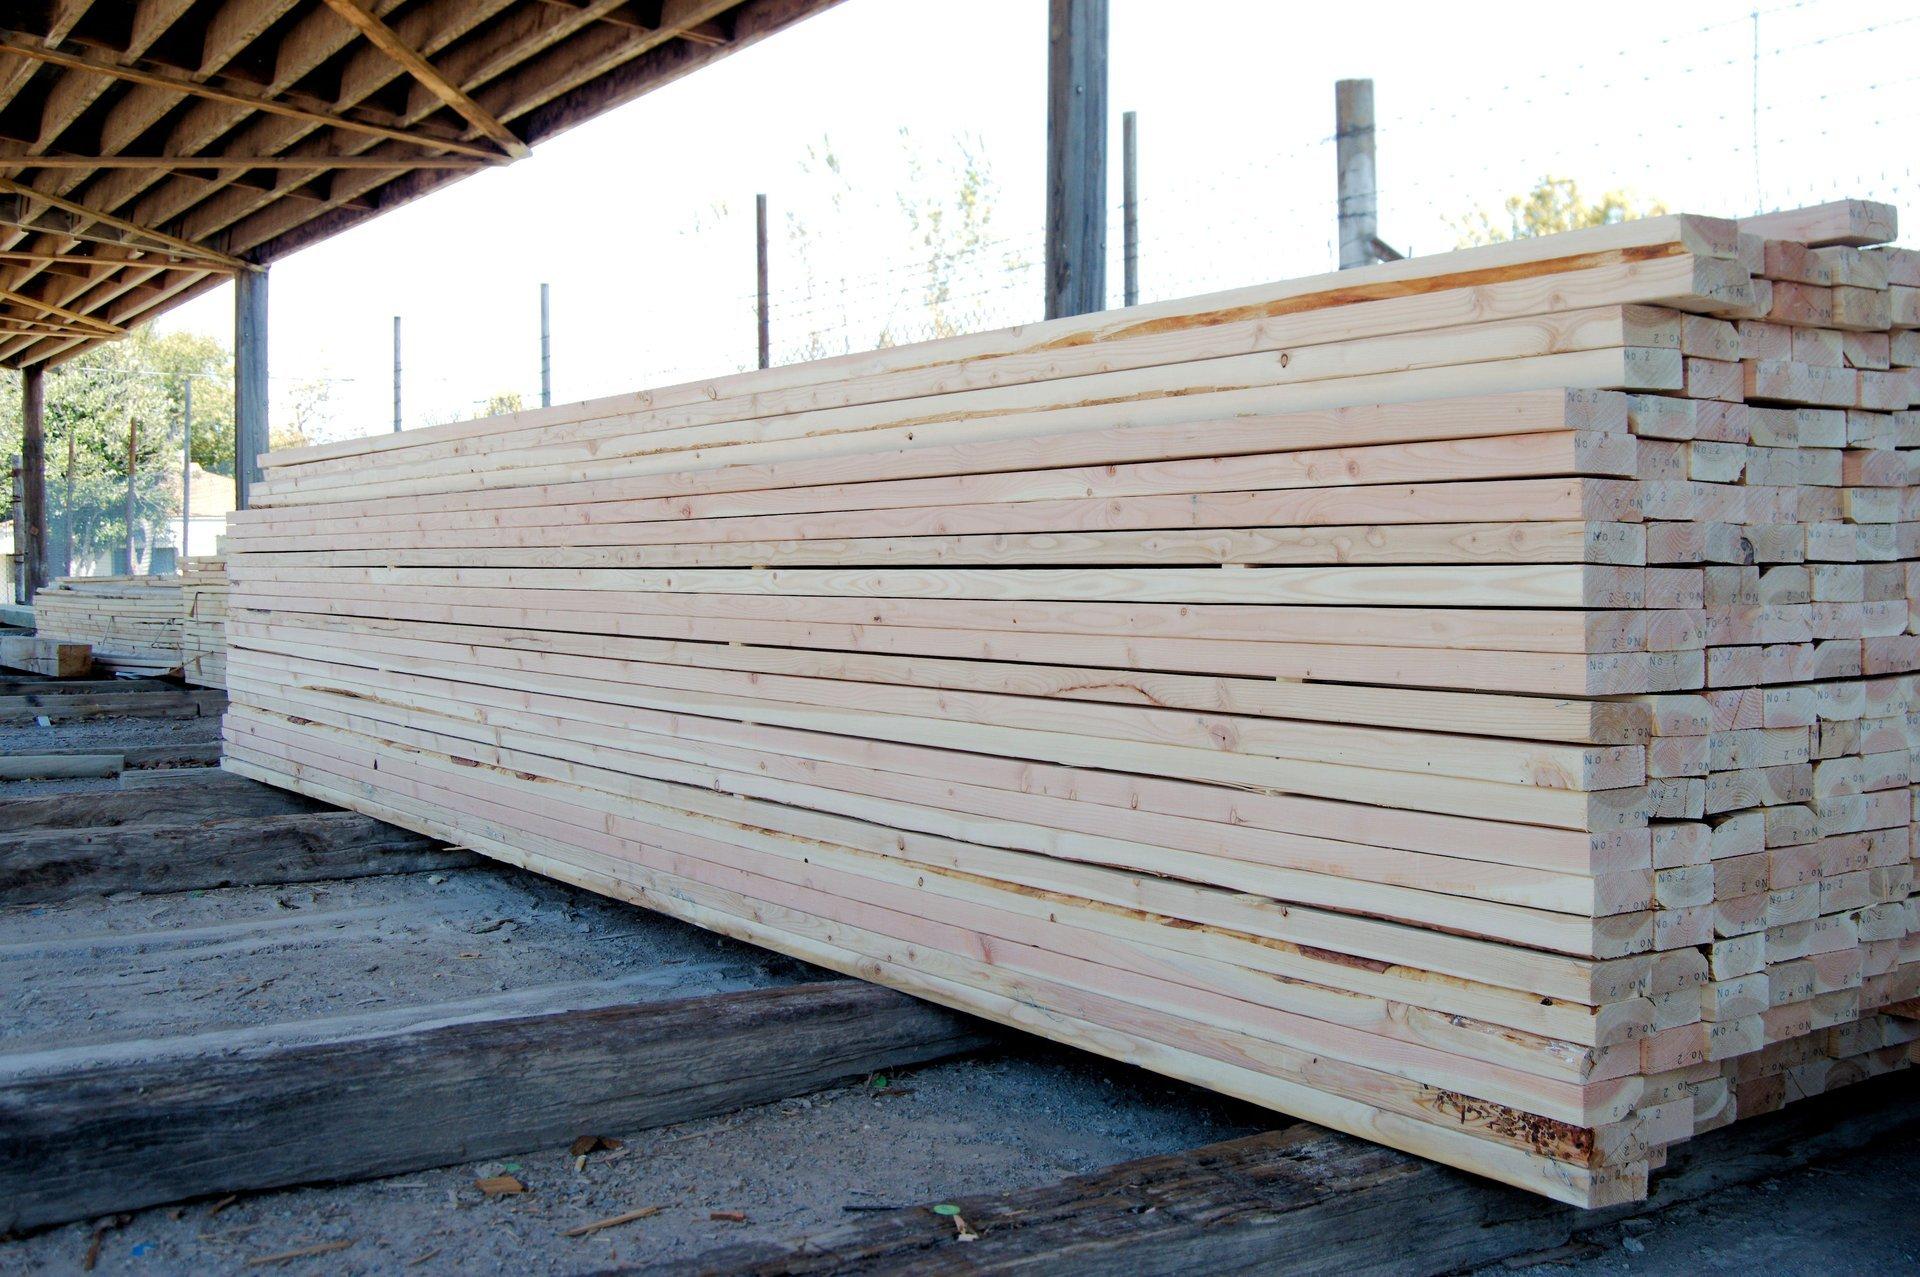 Framing Lumber, I-Joist, LVL, OSB & Siding - Mid-America Lumber on plank siding texture, plank siding options, plank wood houses, plank siding for homes,